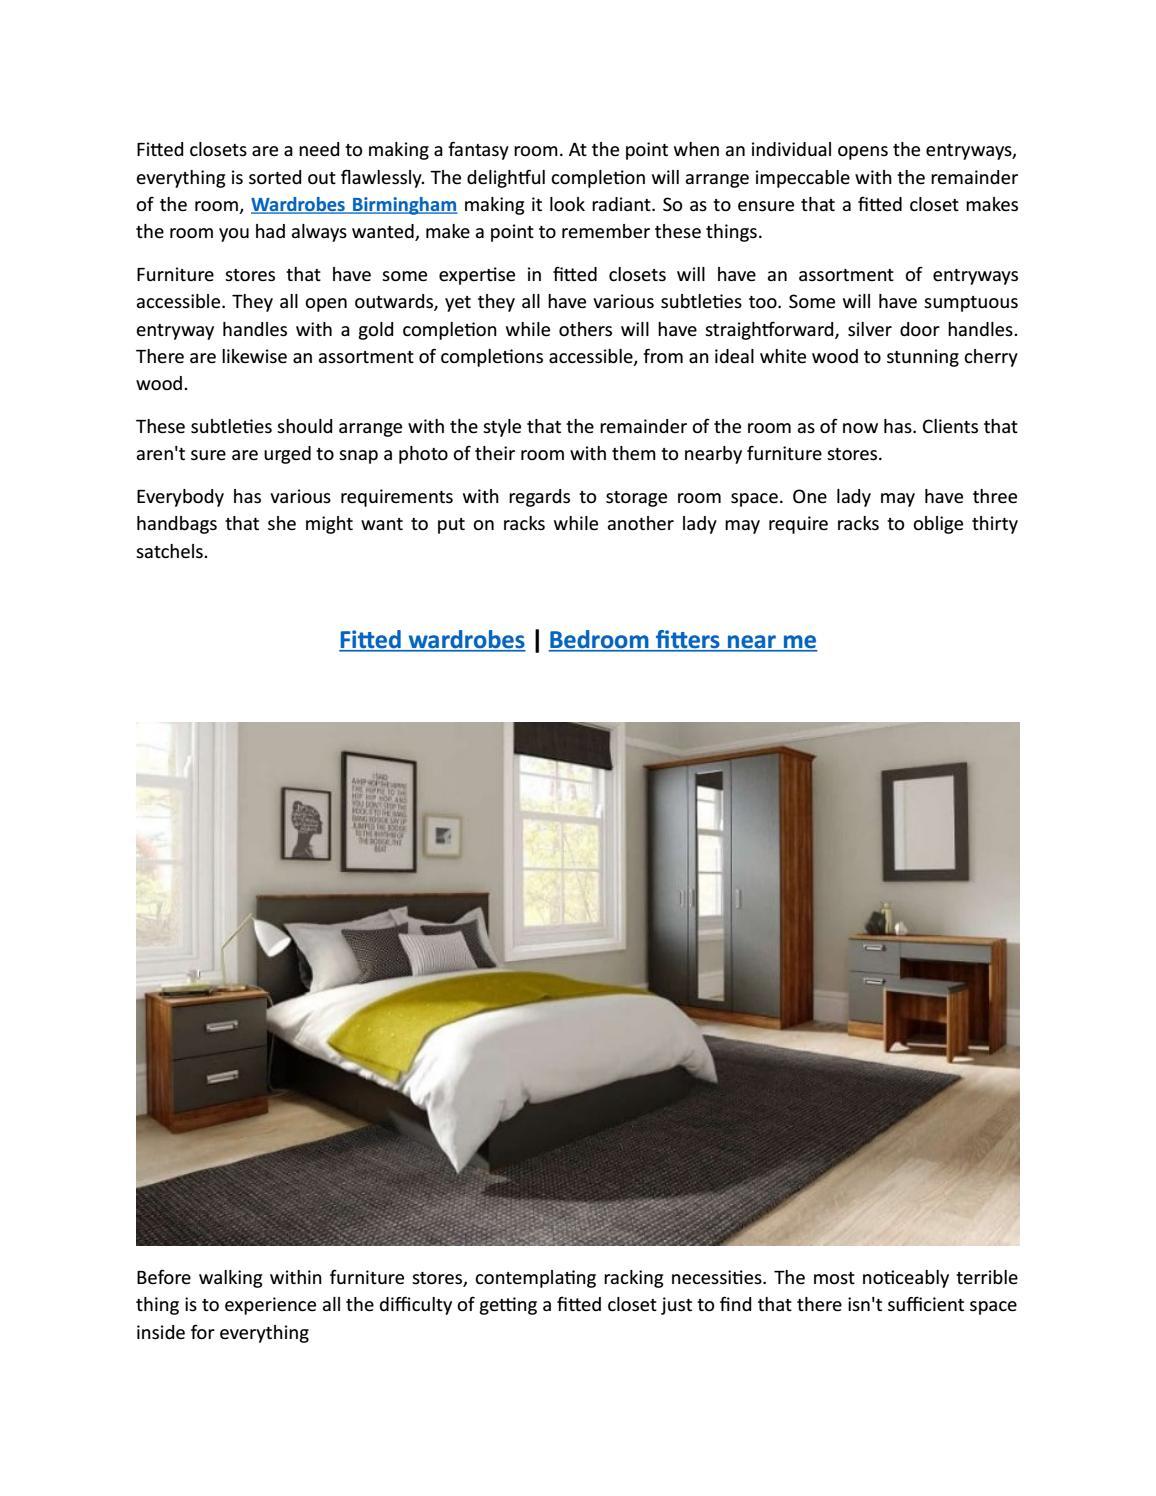 Bedroom Fitters Near Me By Jacksonbird786 Issuu